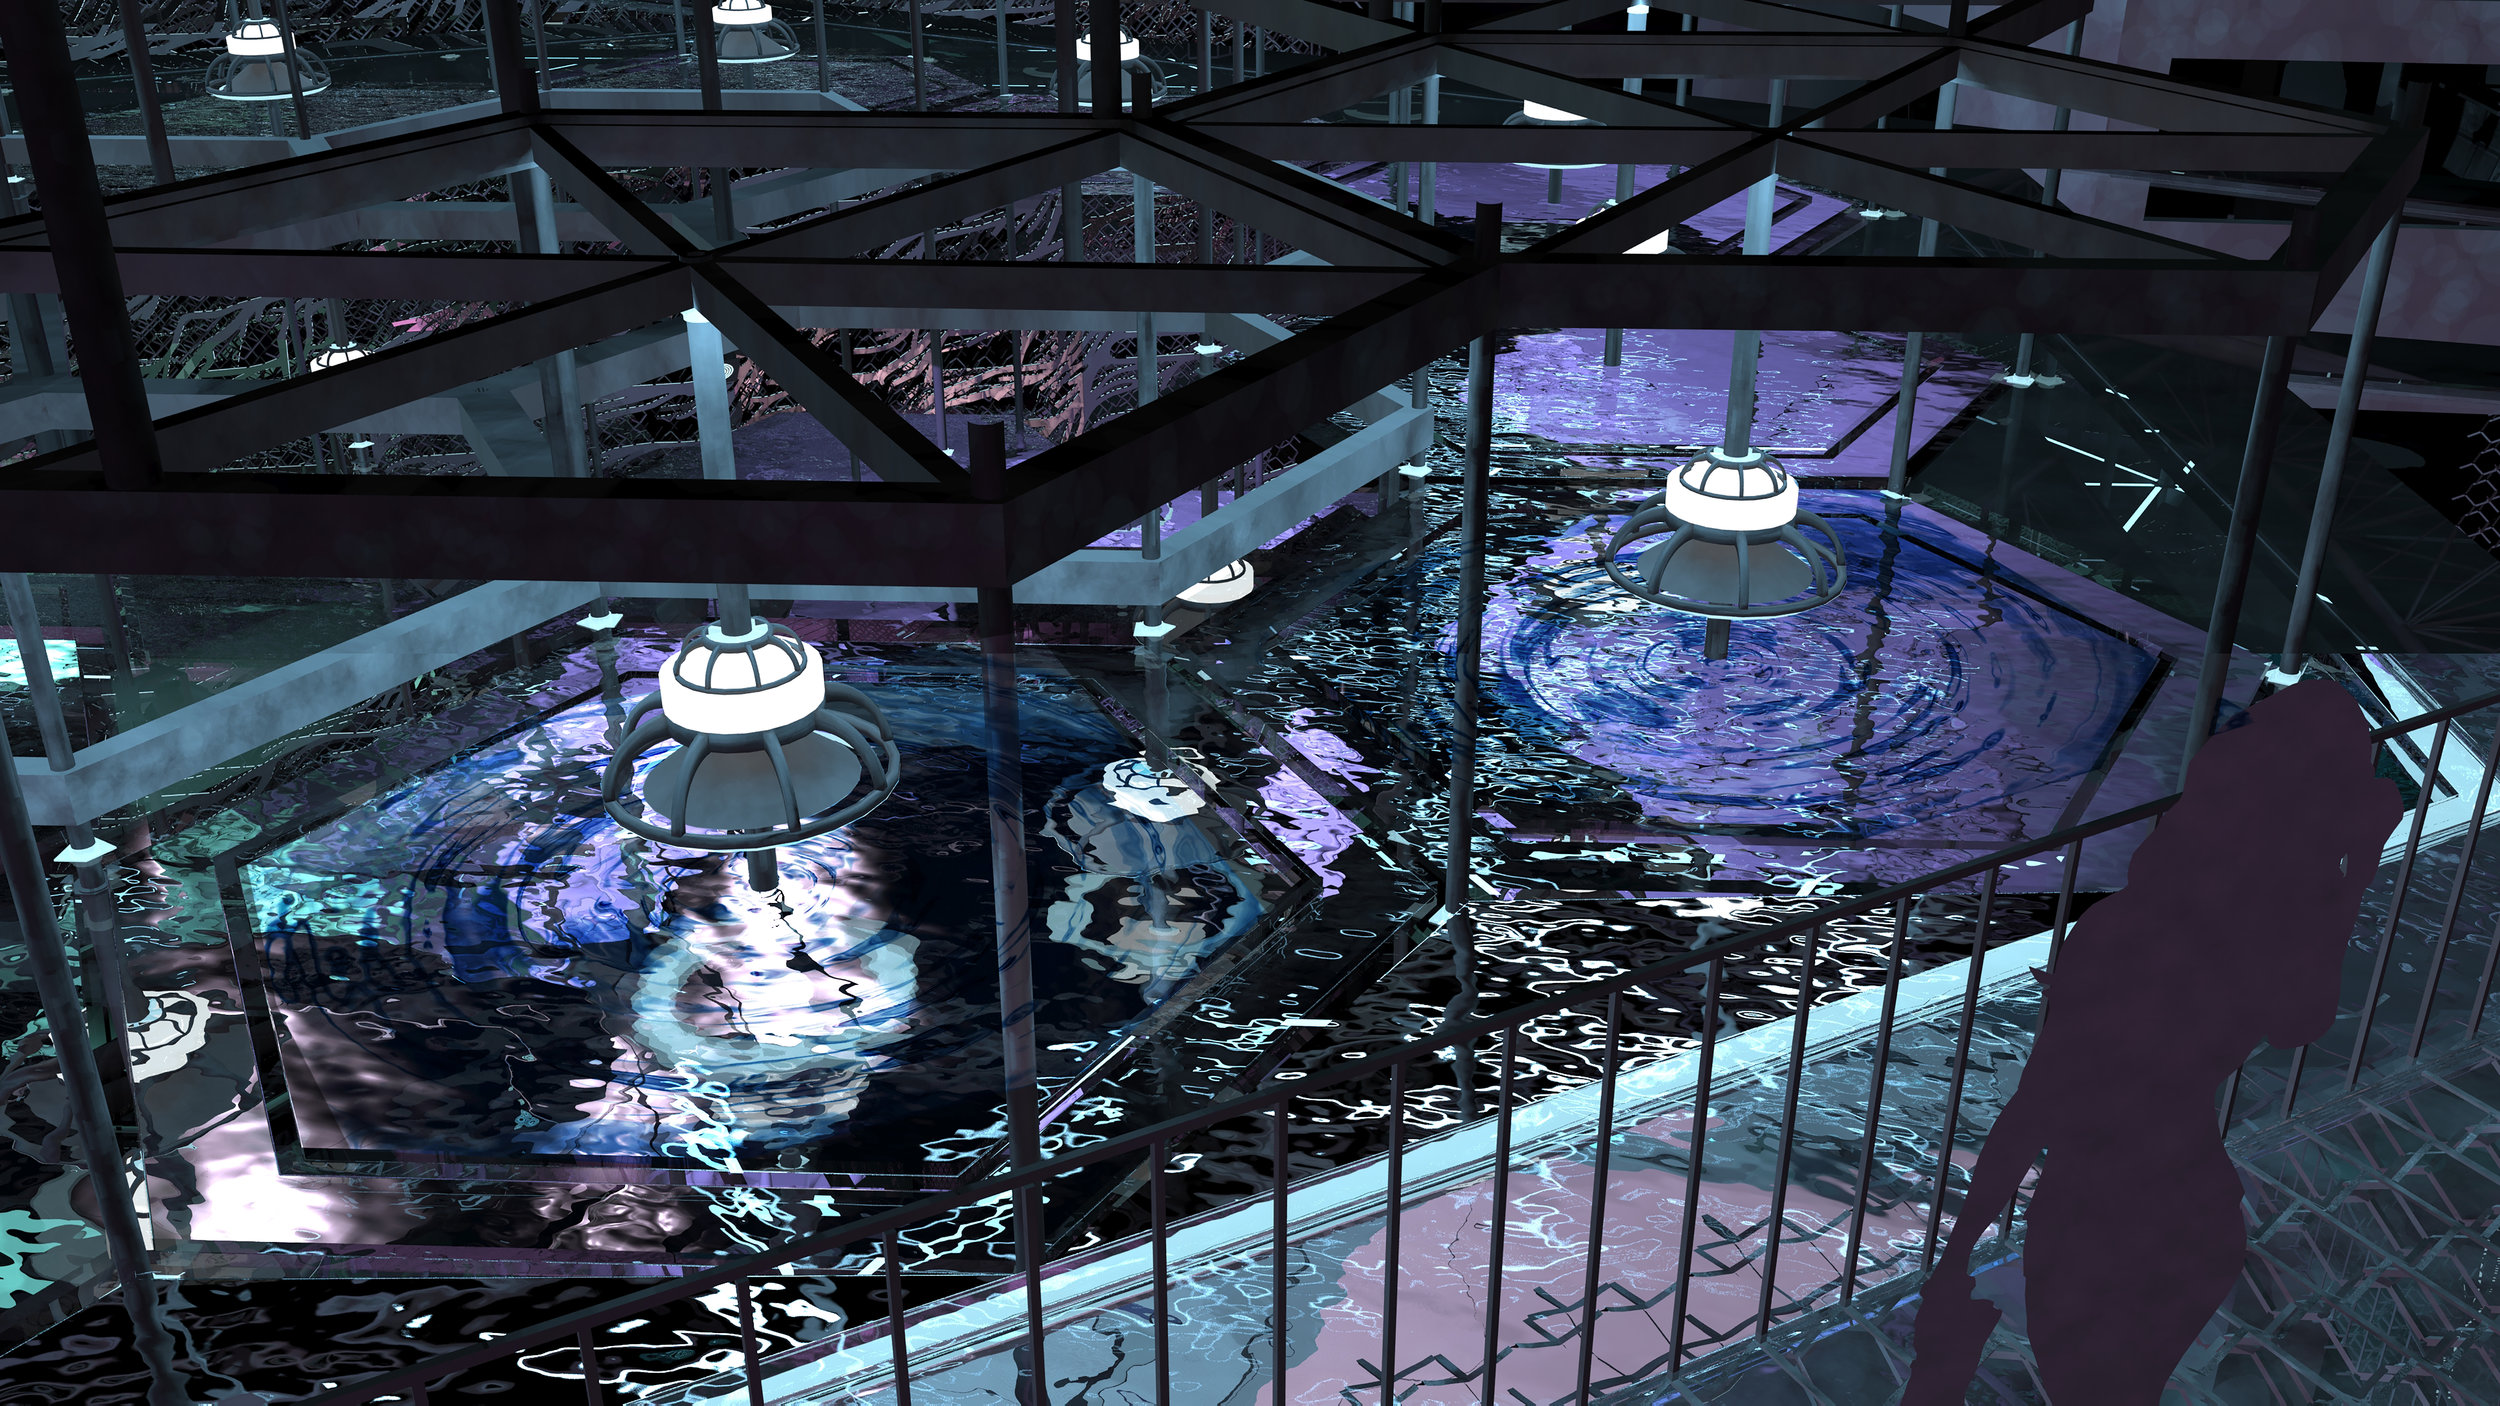 vip looking through cymatic 2.jpg